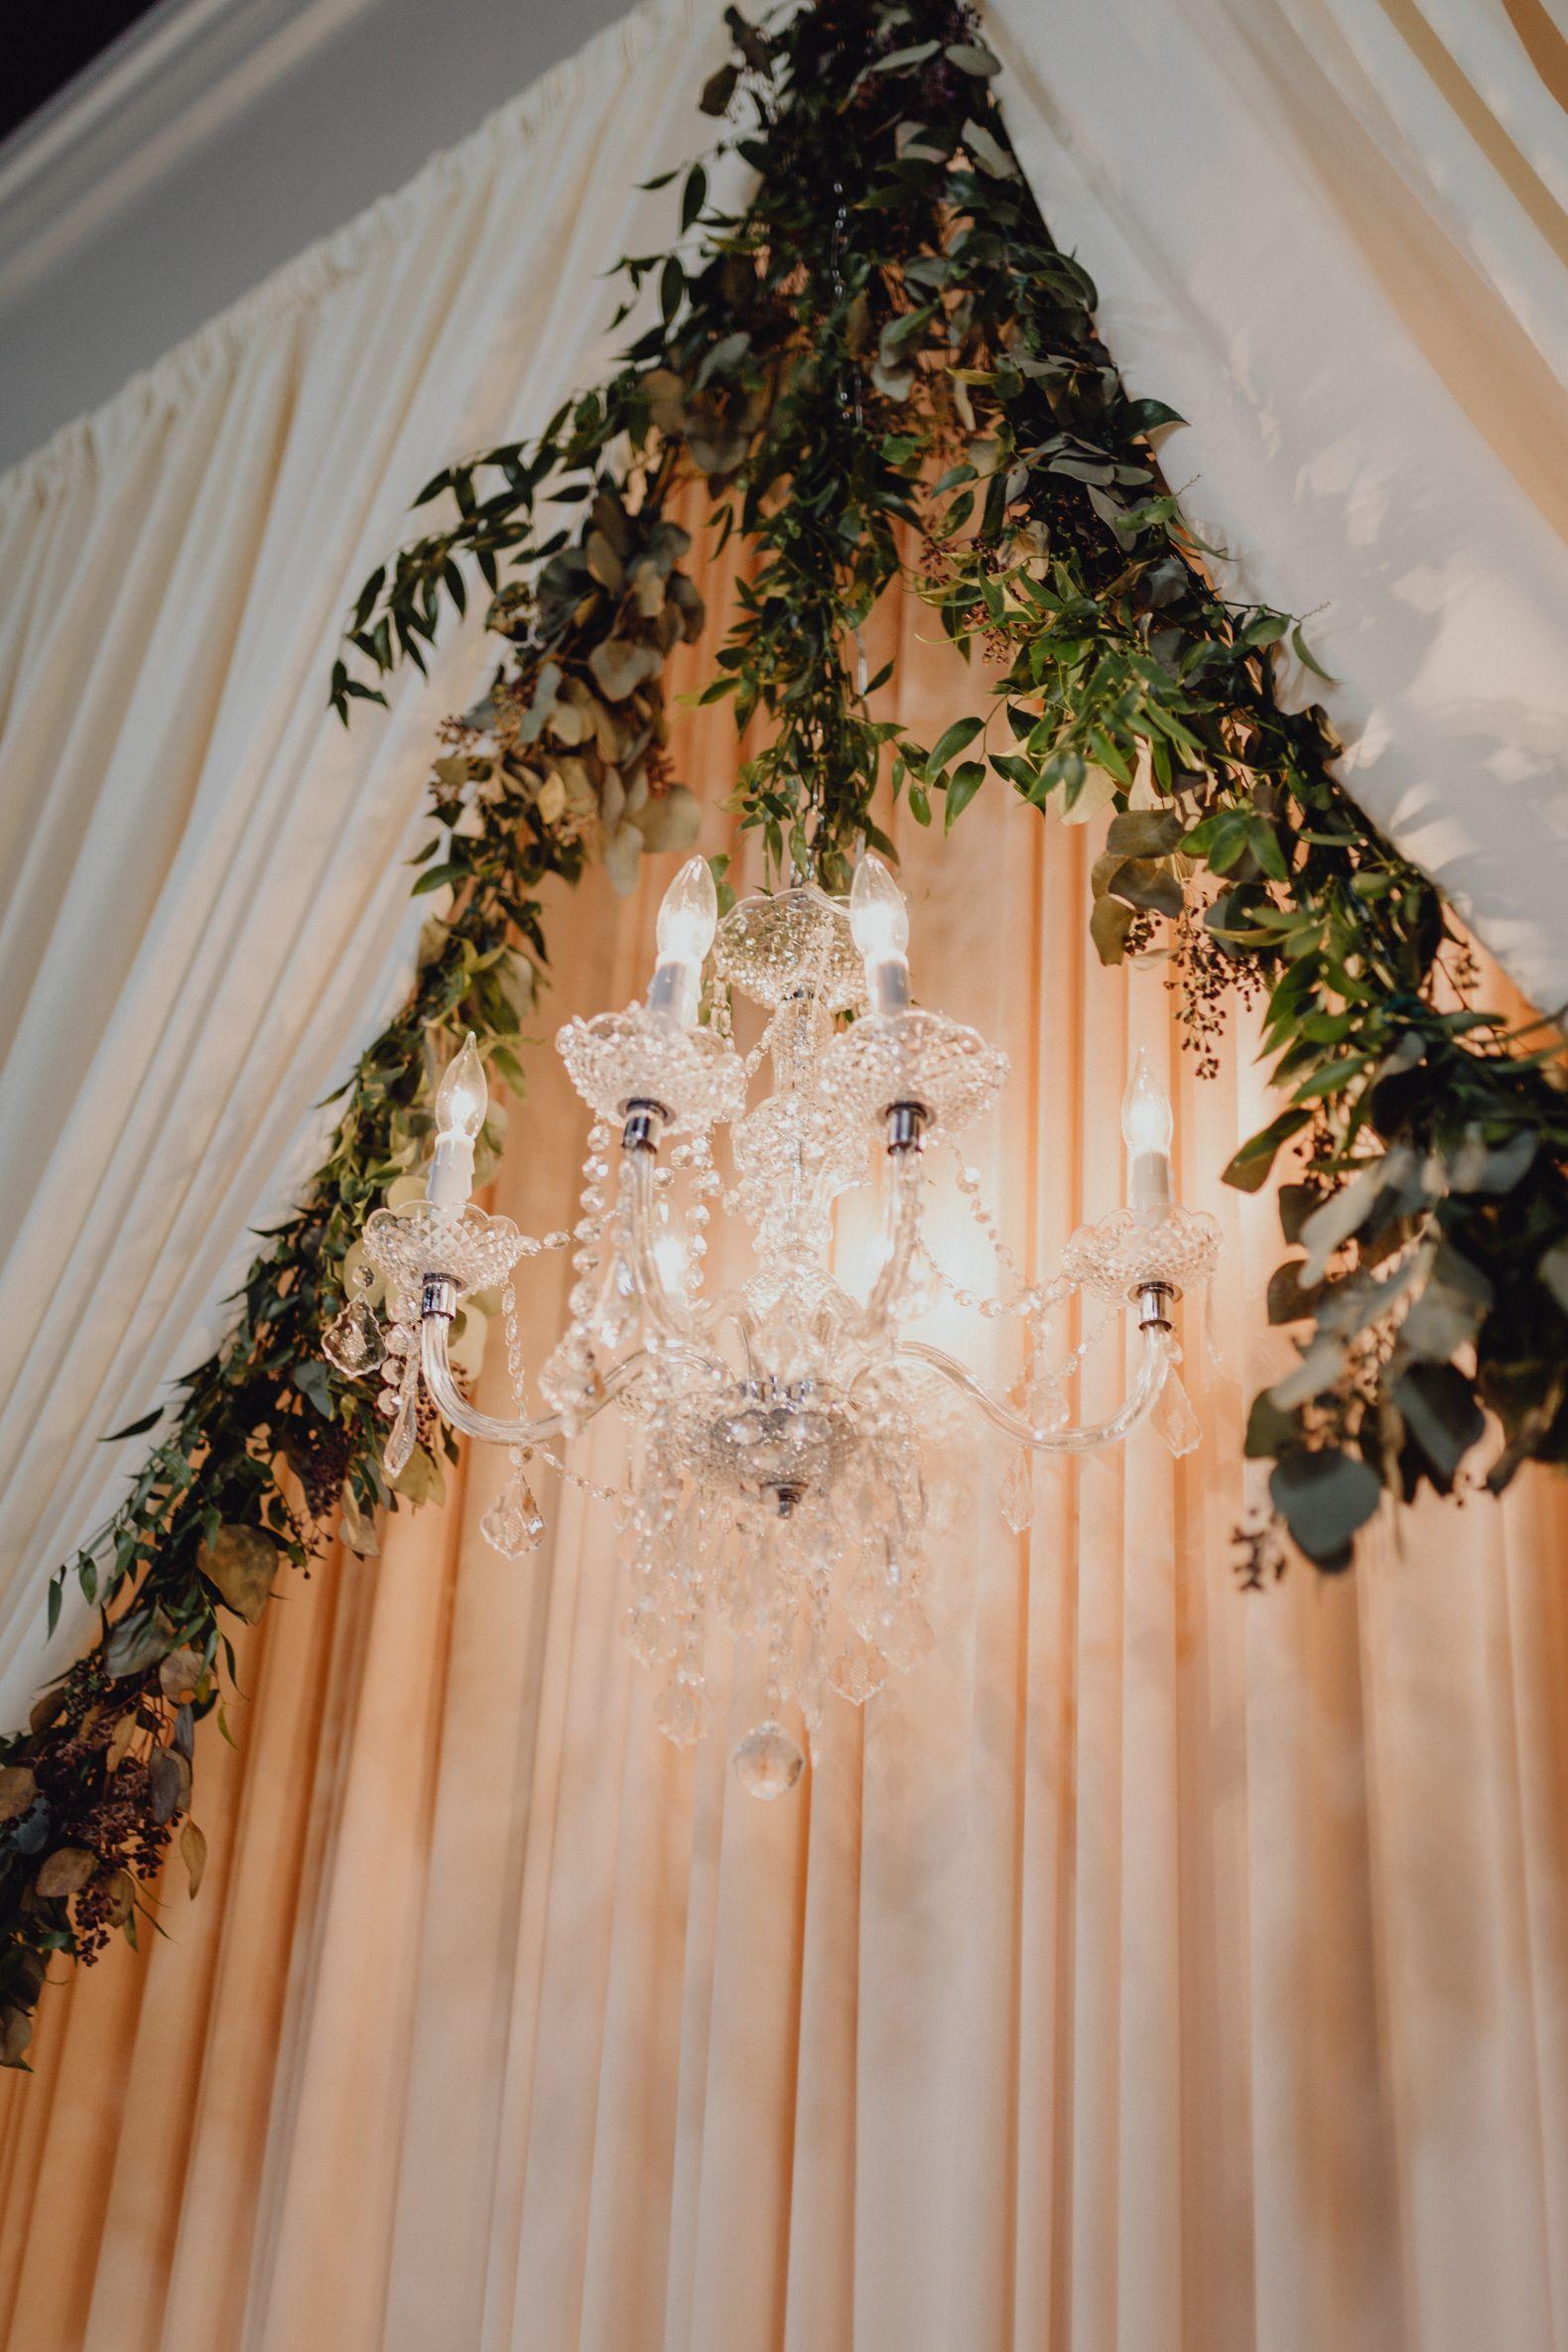 North-Dallas-Wedding-Florist-David-Co.-16.jpg